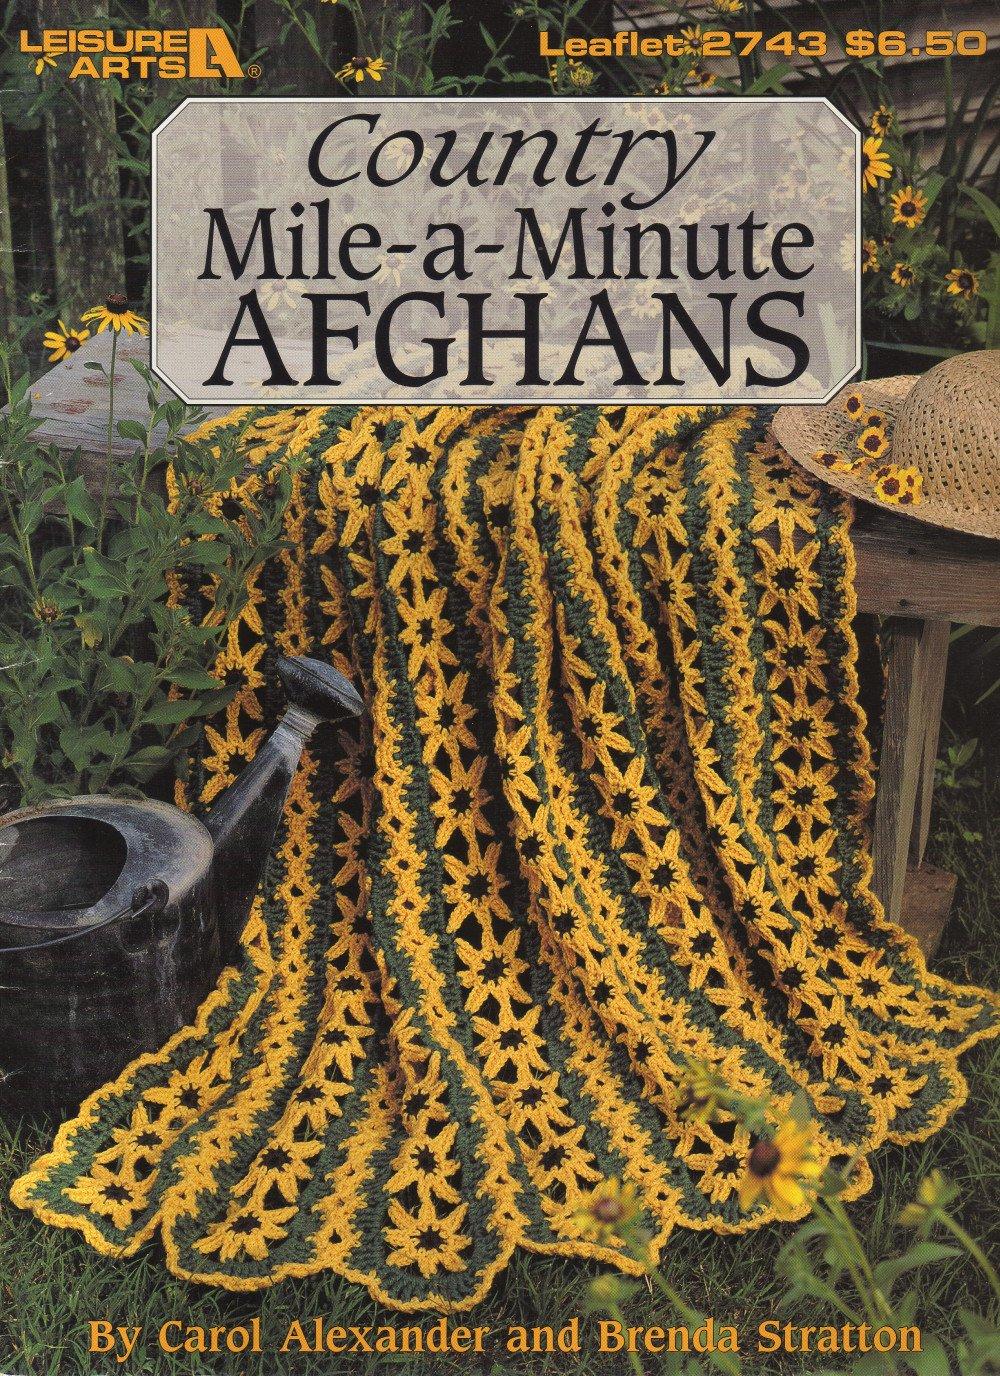 Country Mile-a-Minute Afghans 9 Designs Leisure Arts Leaflet 2743 Carol Alexander - Brenda Stratton